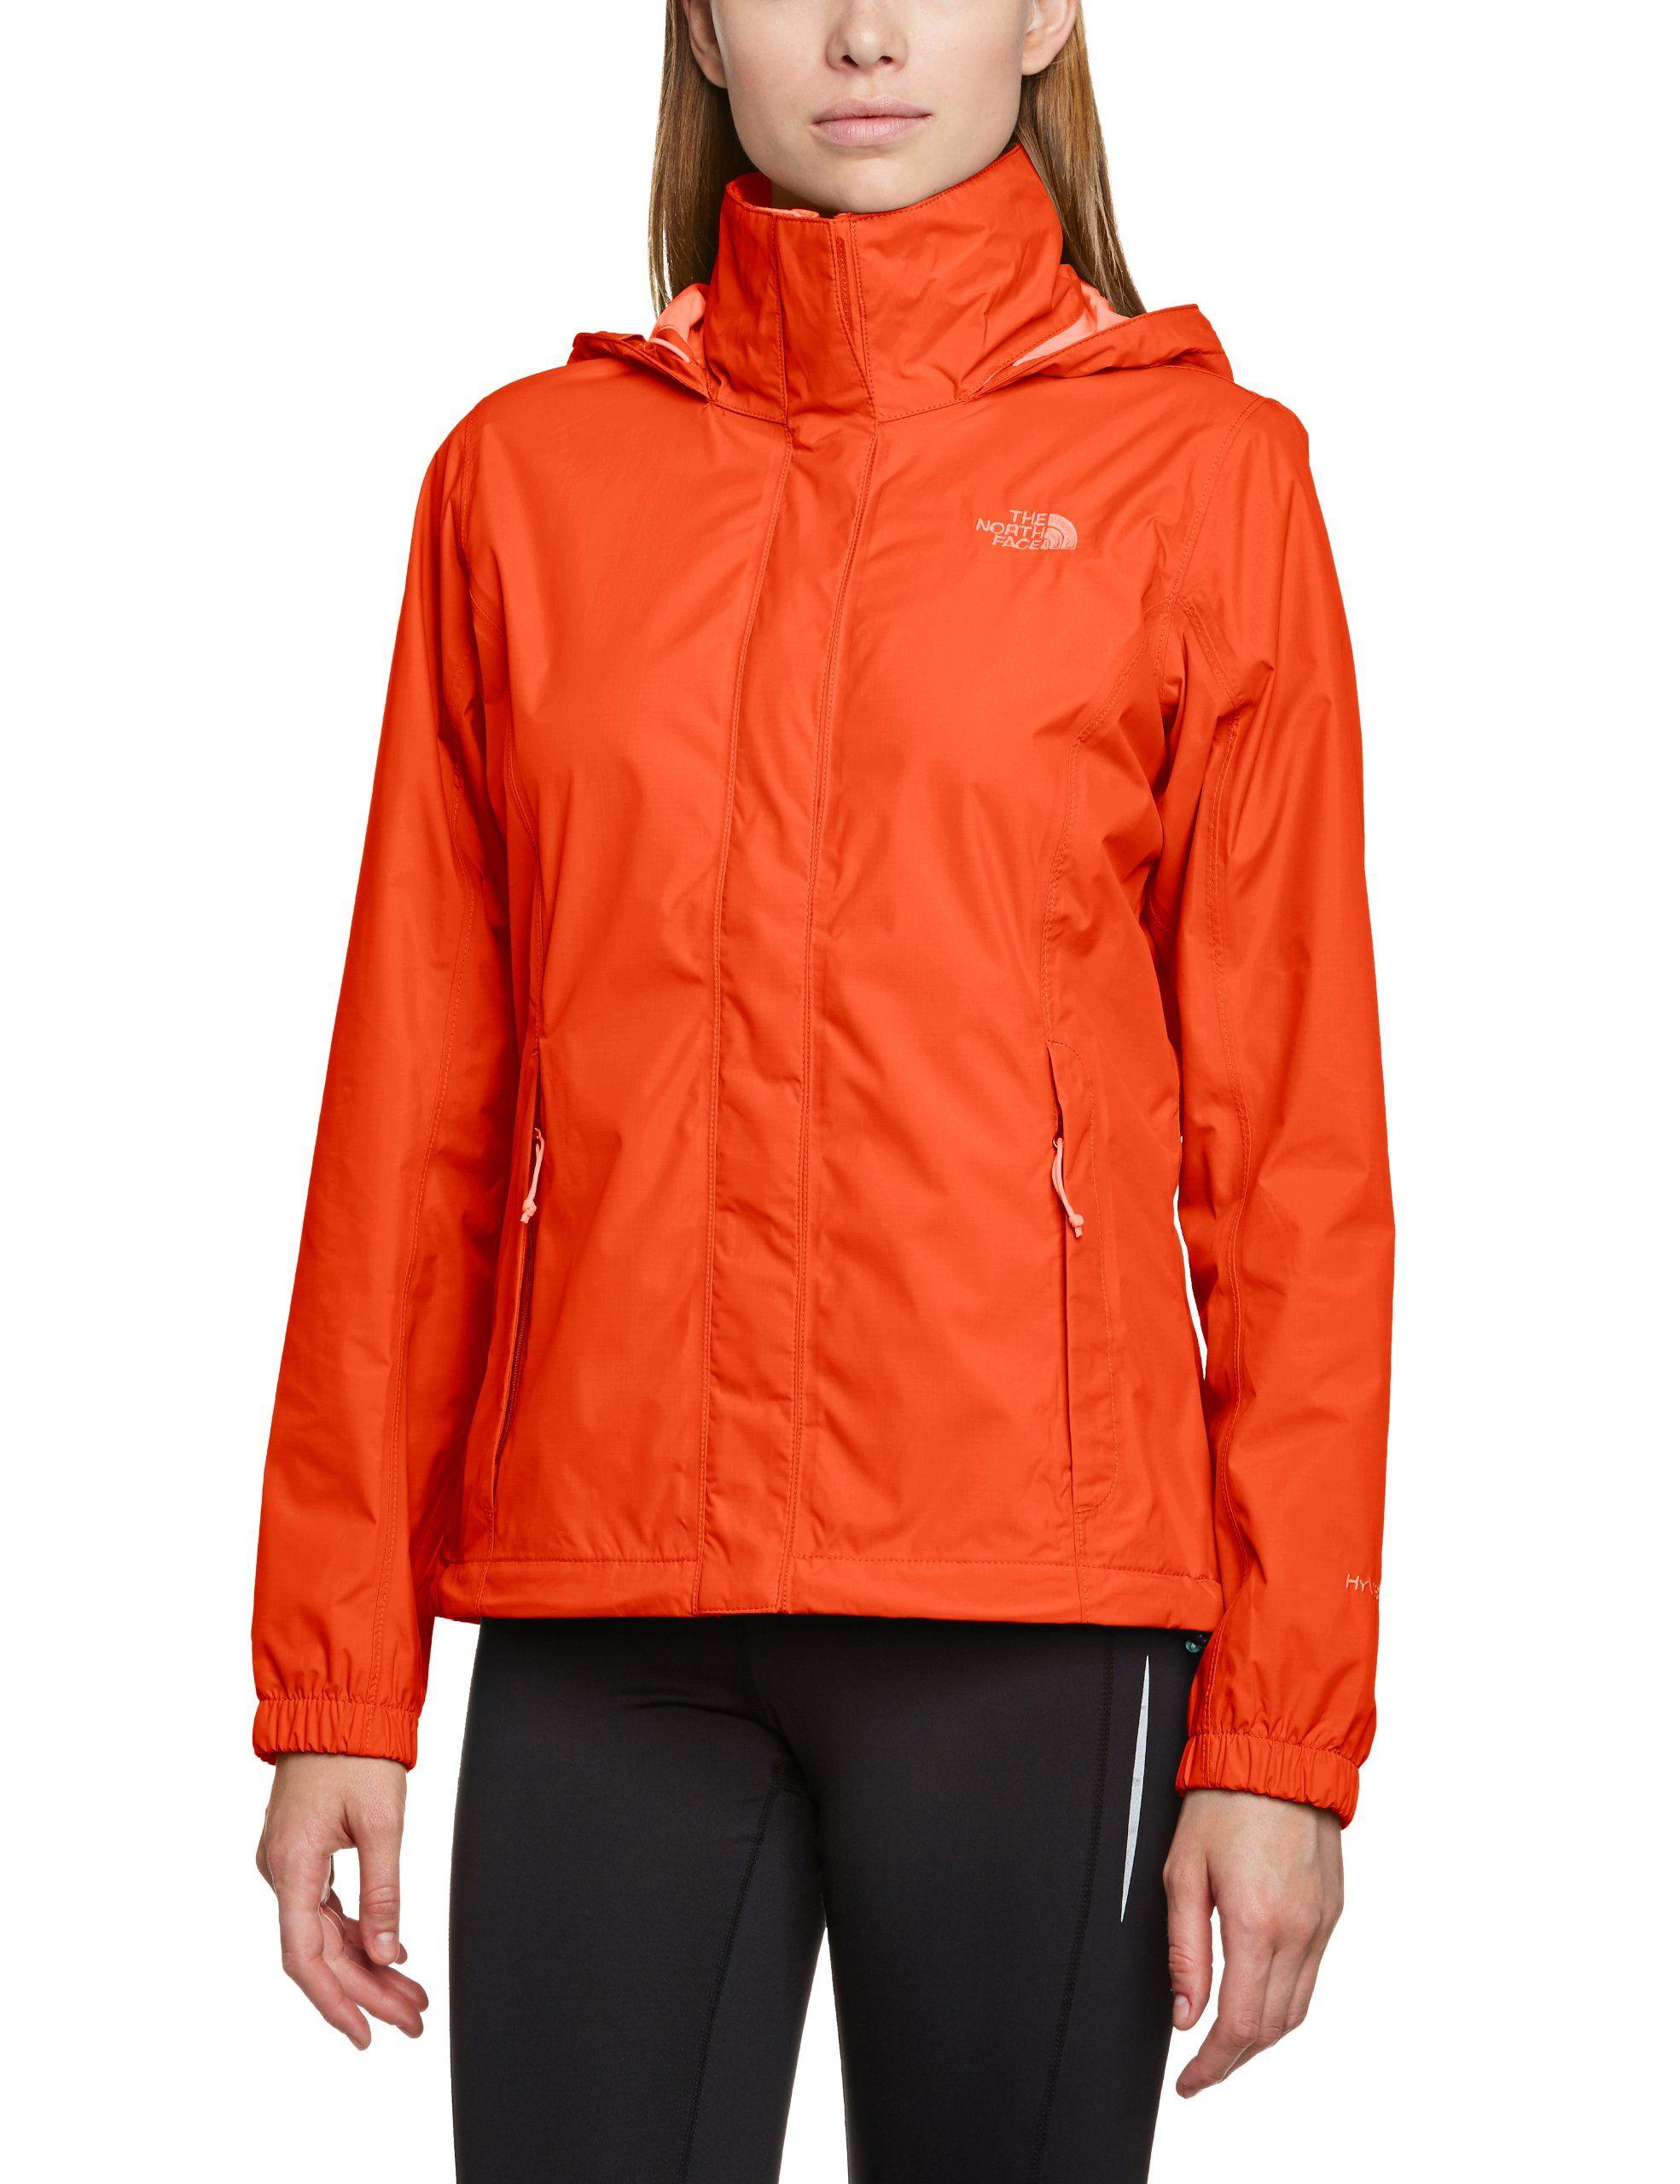 Amazon Com The North Face Women S Resolve Rain Jacket Sports Outdoors 121 Orange Or Black North Face Women Jackets Rain Jacket [ 2560 x 1969 Pixel ]